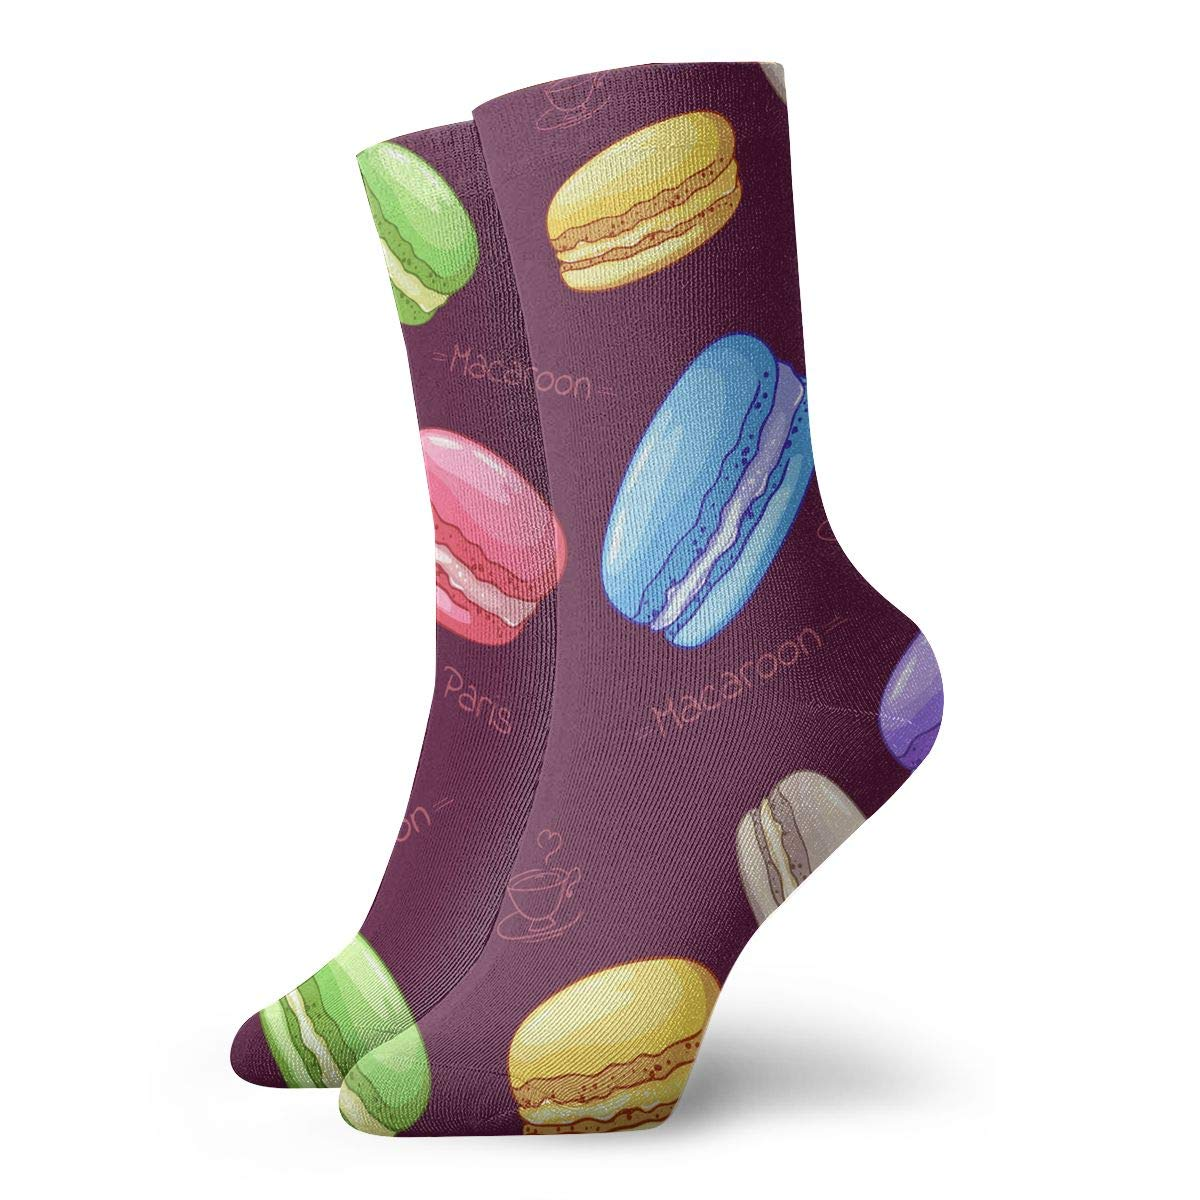 Colorful Beautiful French Macaron Dessert Fashion Dress Socks Short Socks Leisure Travel 11.8 Inch